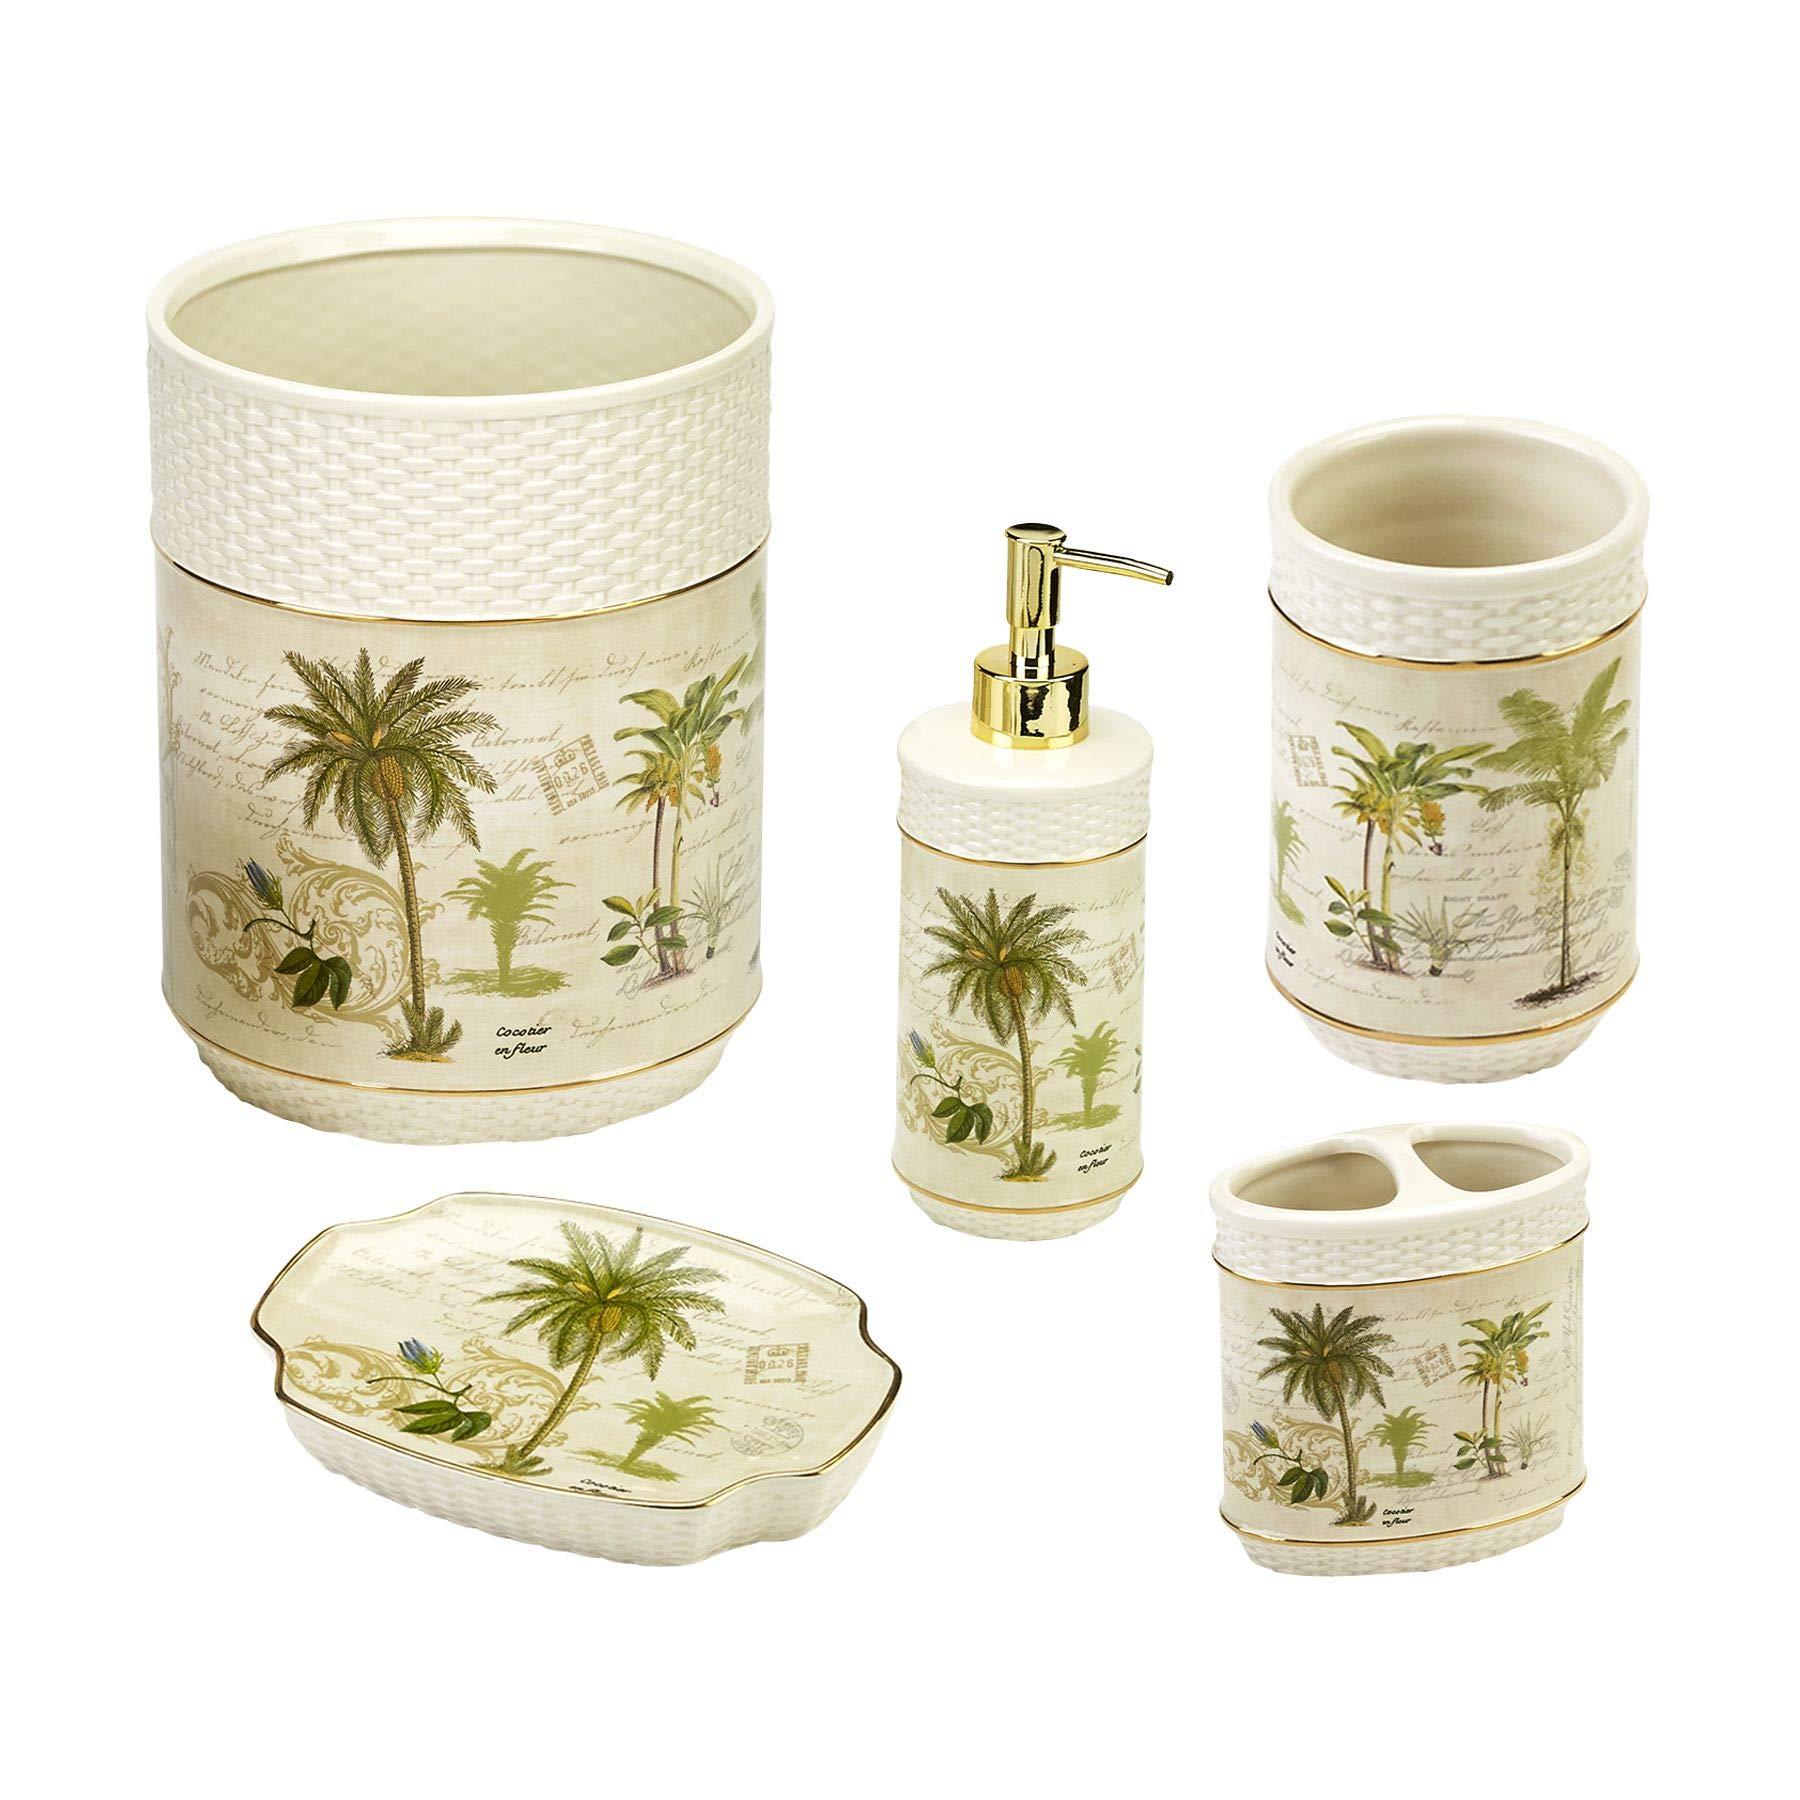 Avanti Linens Colony Palm 5 Piece Bath Accessory Set - Ivory Tumbler, Toothbrush Holder, Soap Dish, Loption Pump, Wastebasket,